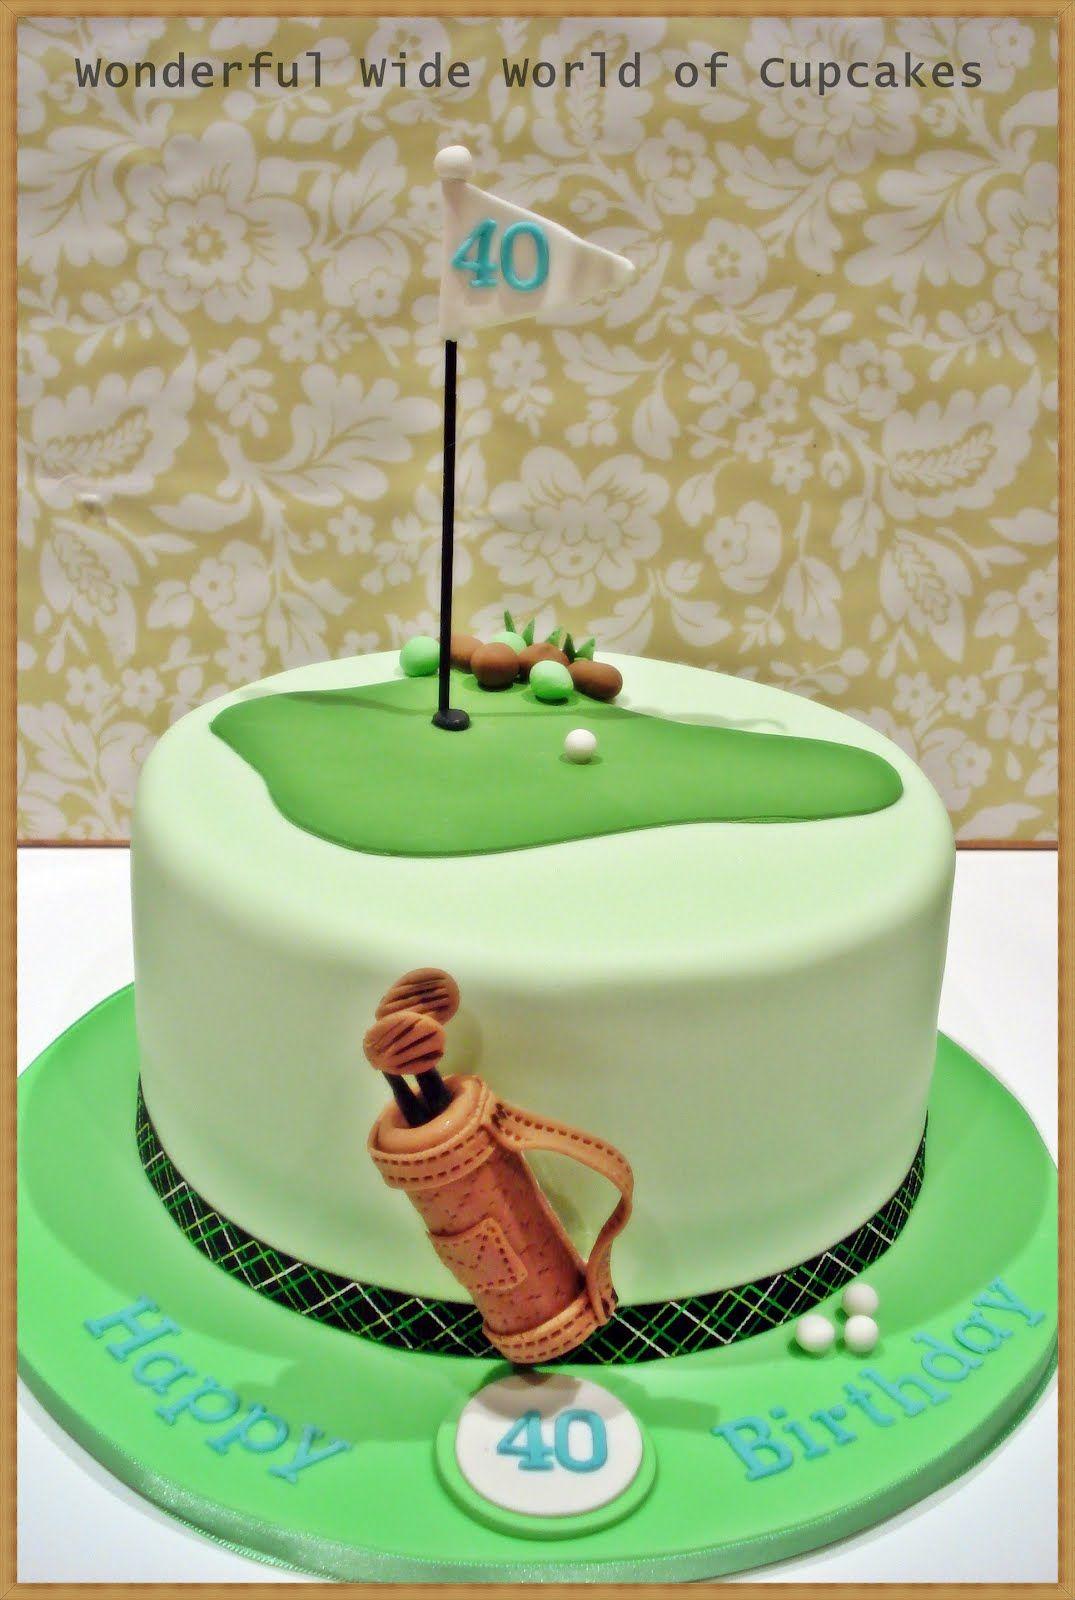 Wonderful World Of Golf Hogan Vs Snead Details